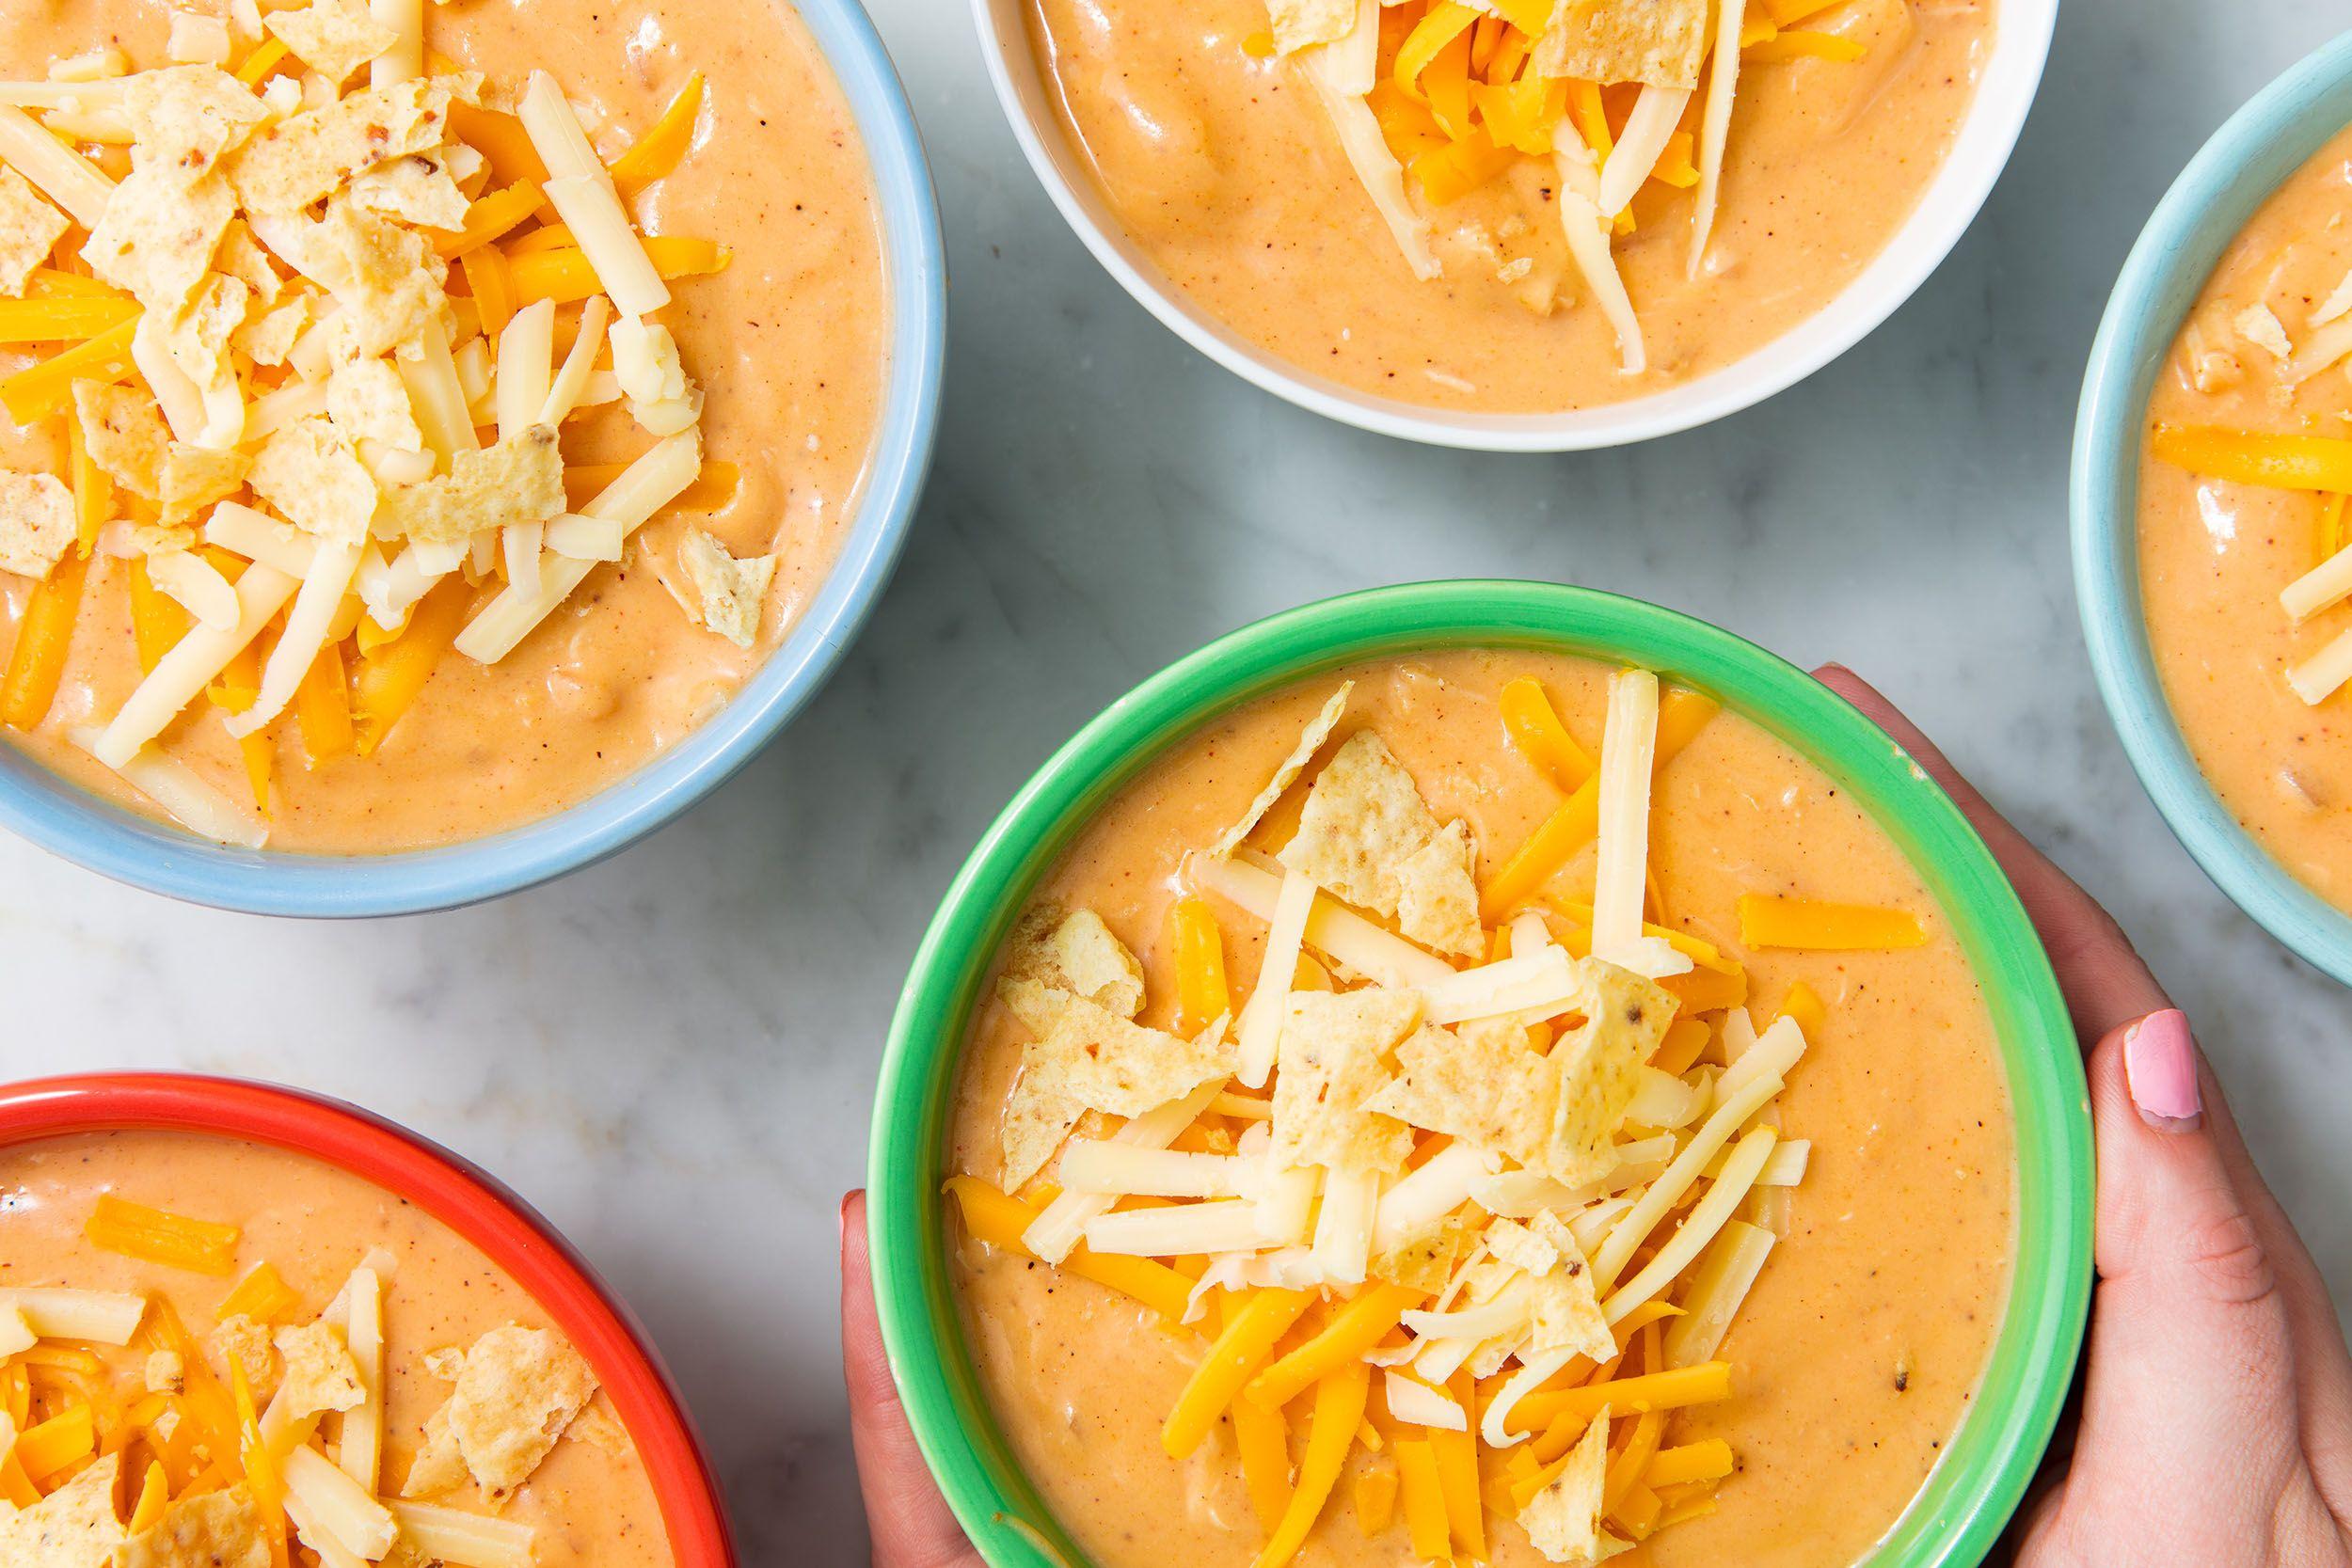 Best Chili S Chicken Enchilada Soup Recipe How To Make Chili S Chicken Enchilada Soup